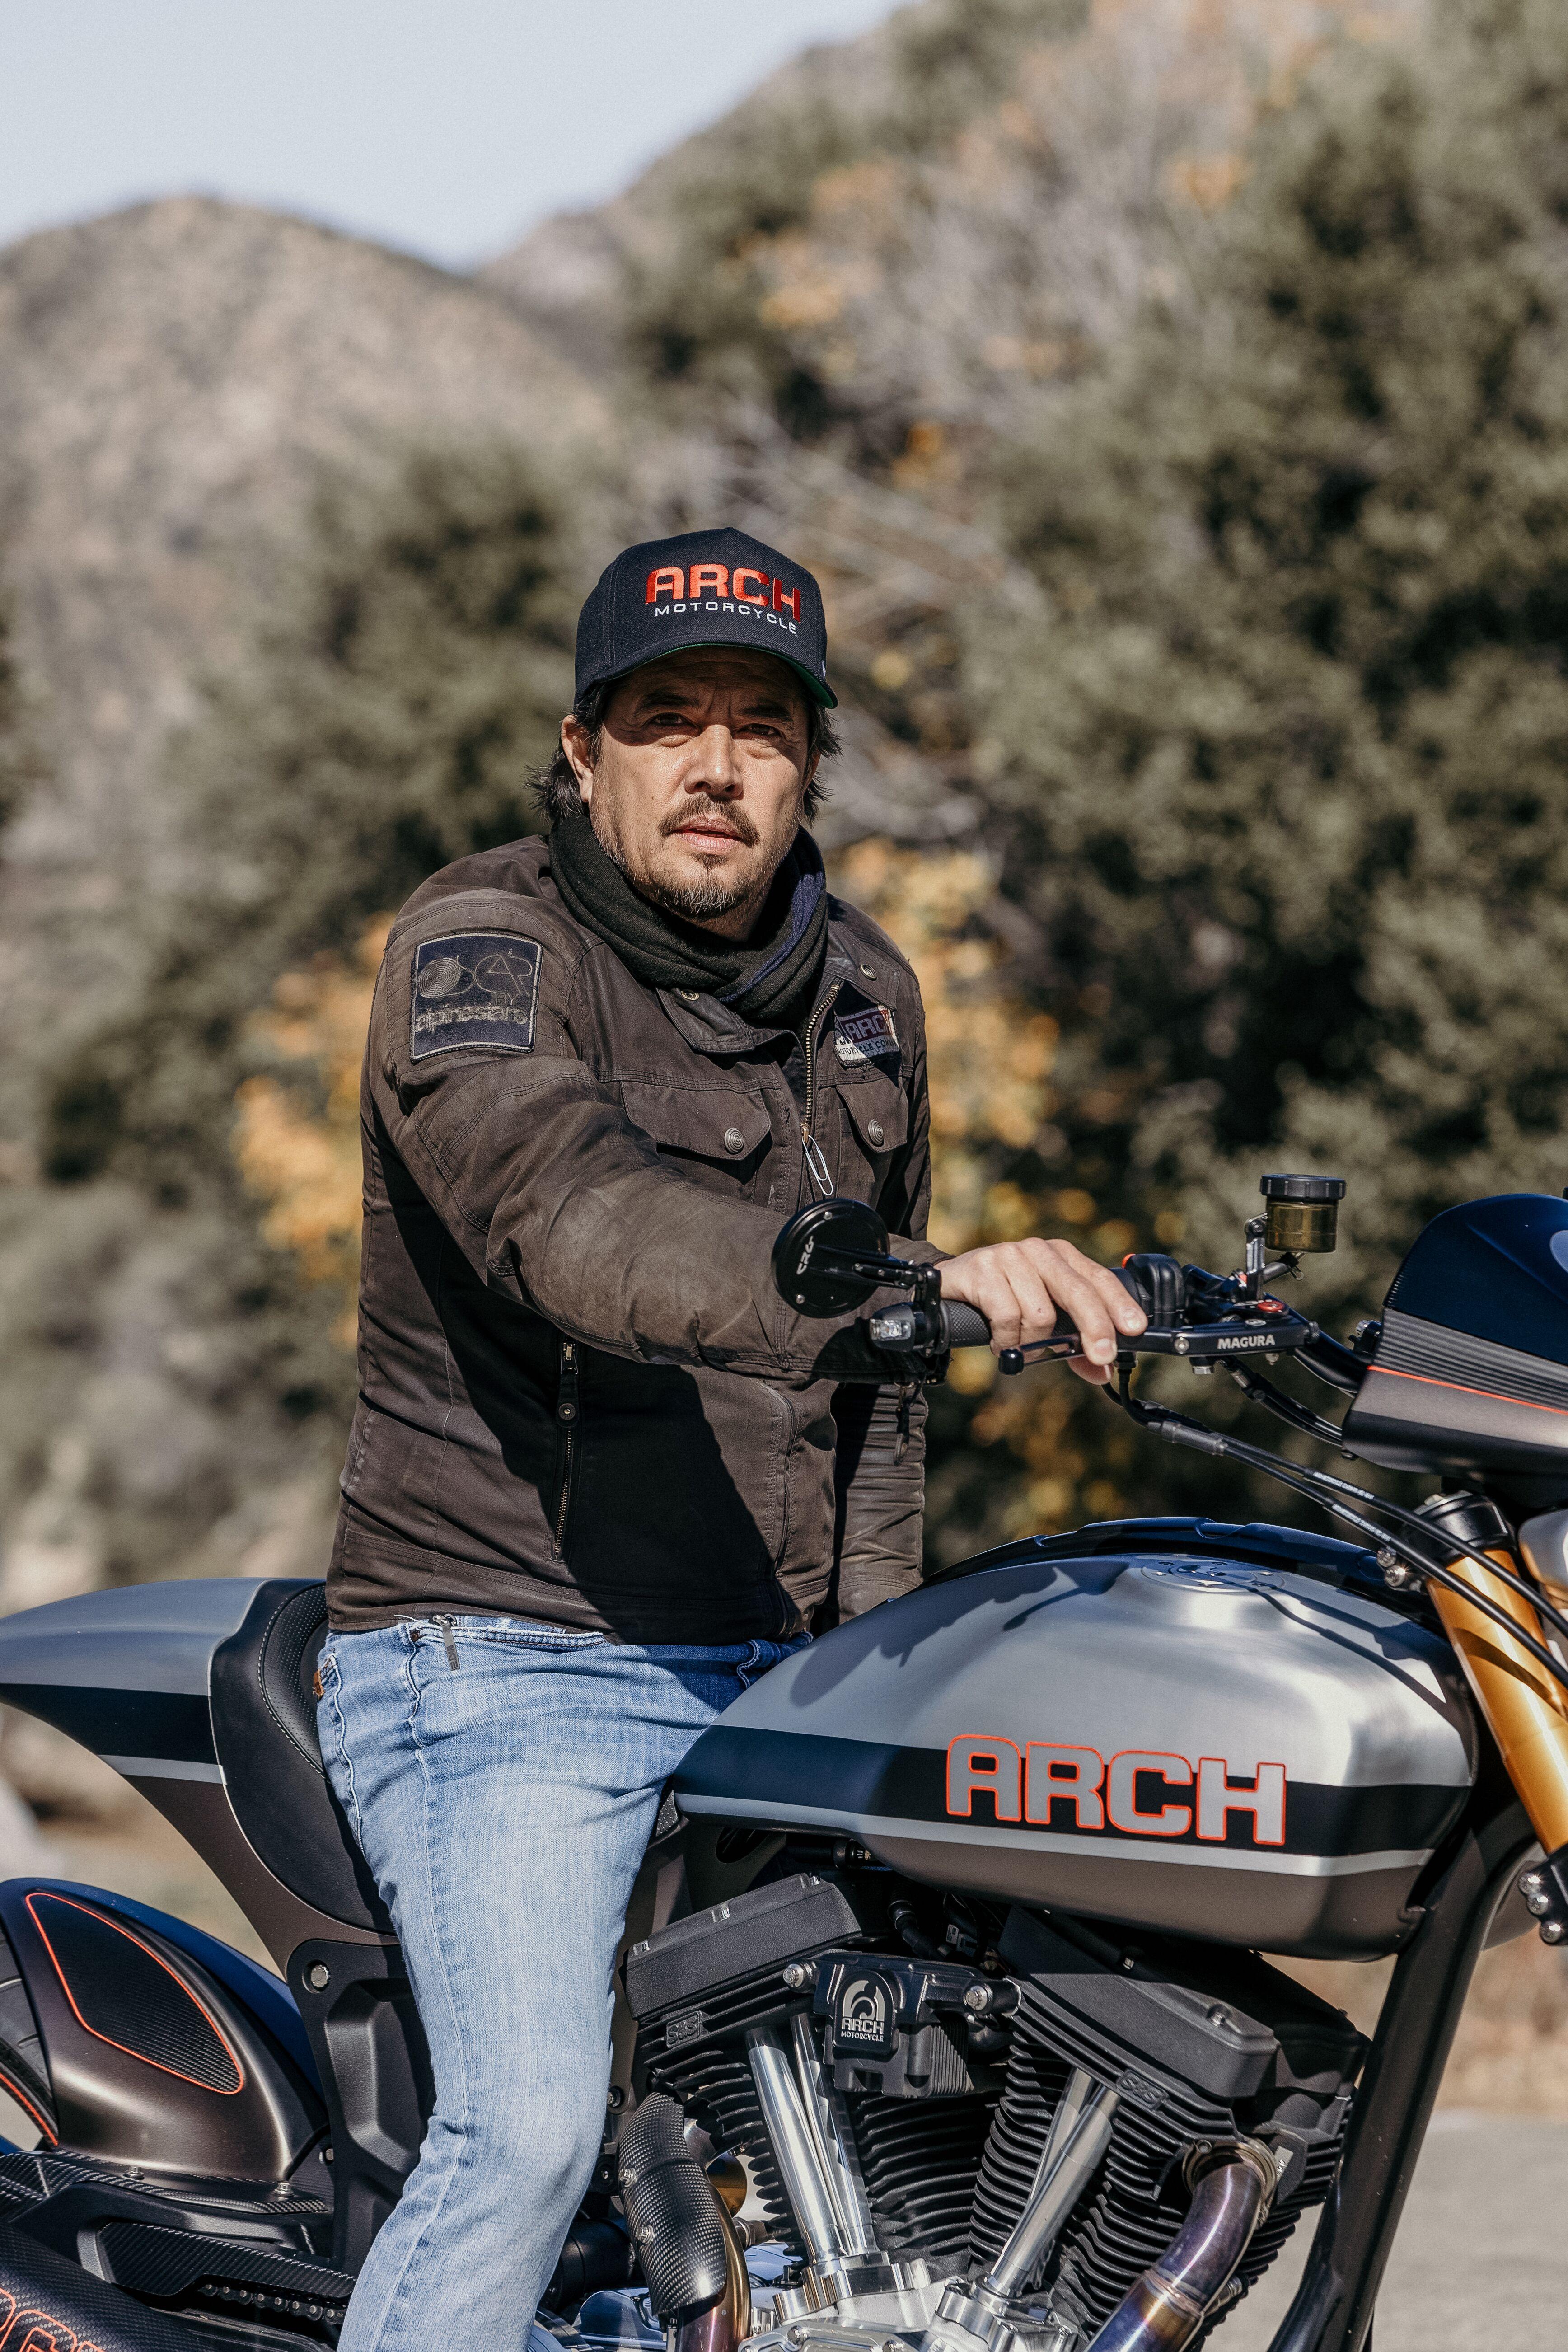 Gard Hollinger Keanu Reeves business partner